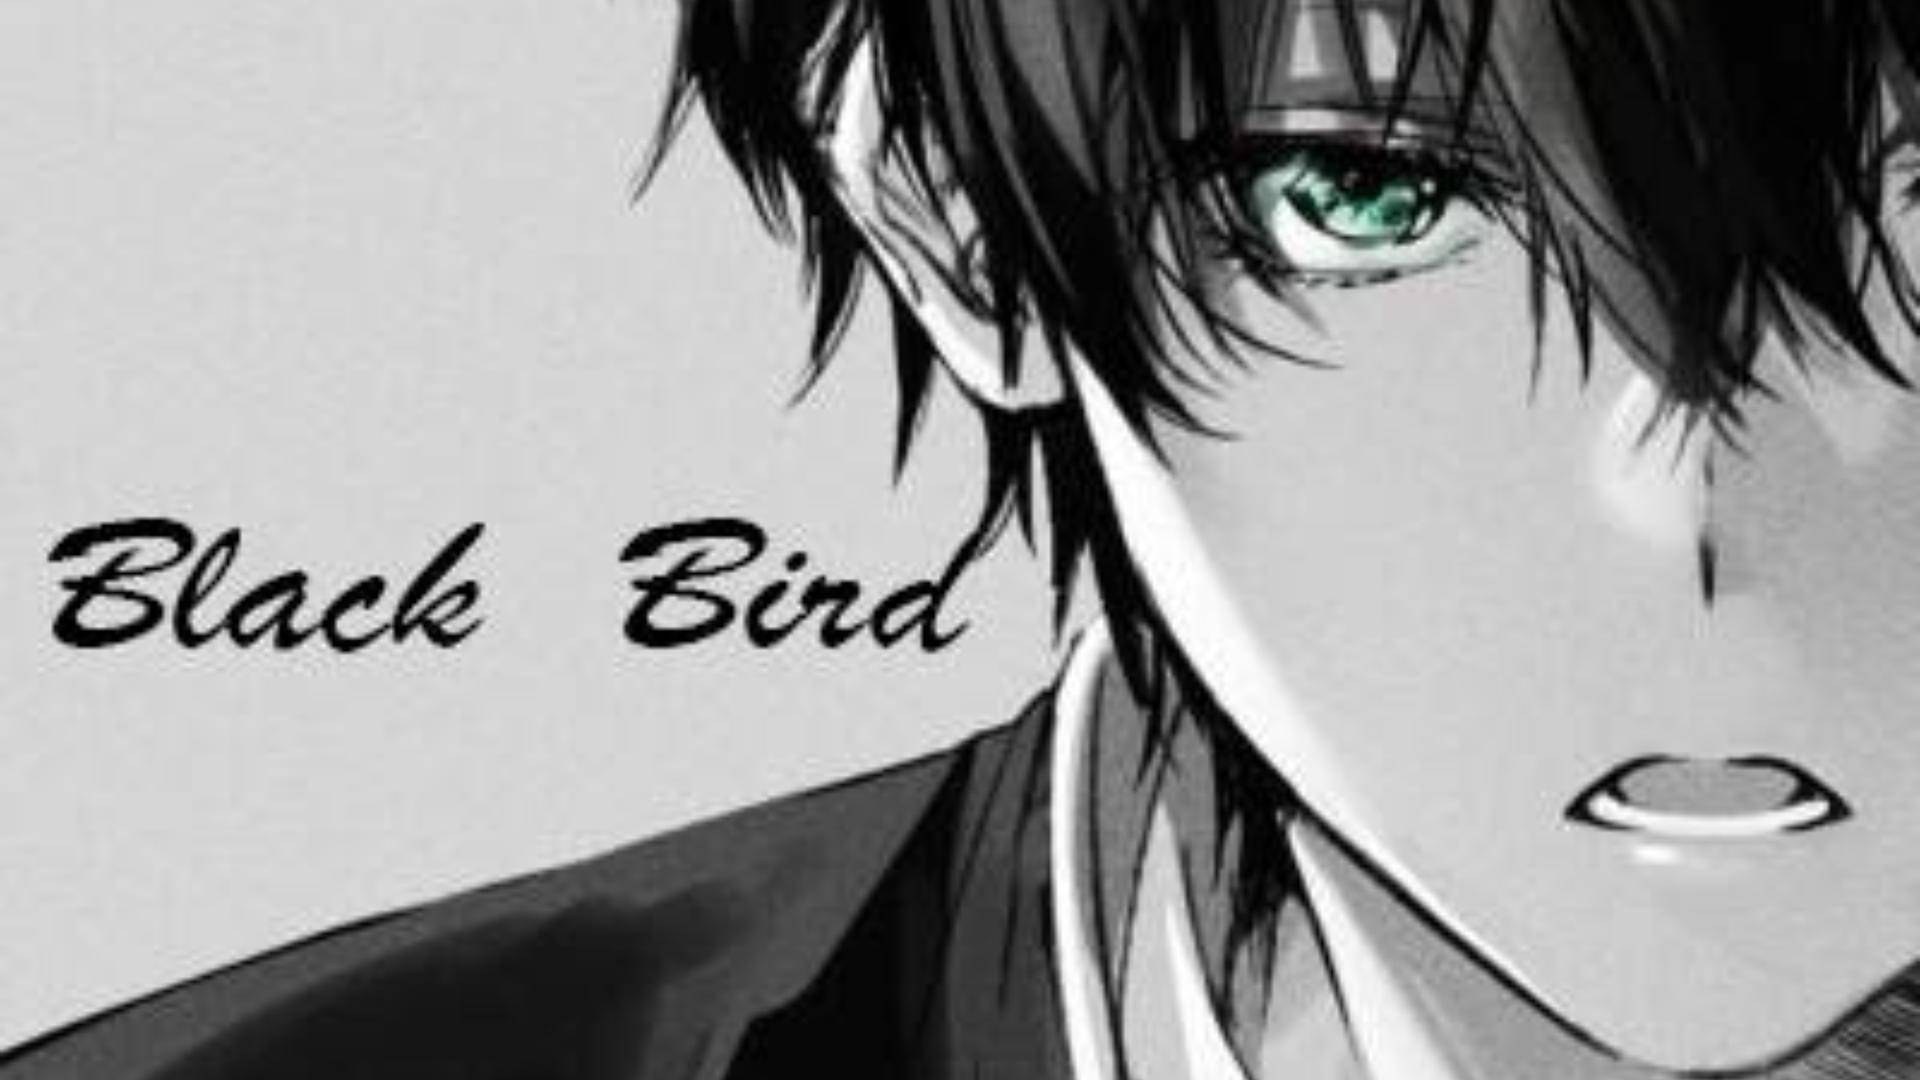 【Black BirdX折木奉太郎】不是每个人的生活,都要多彩绚烂。